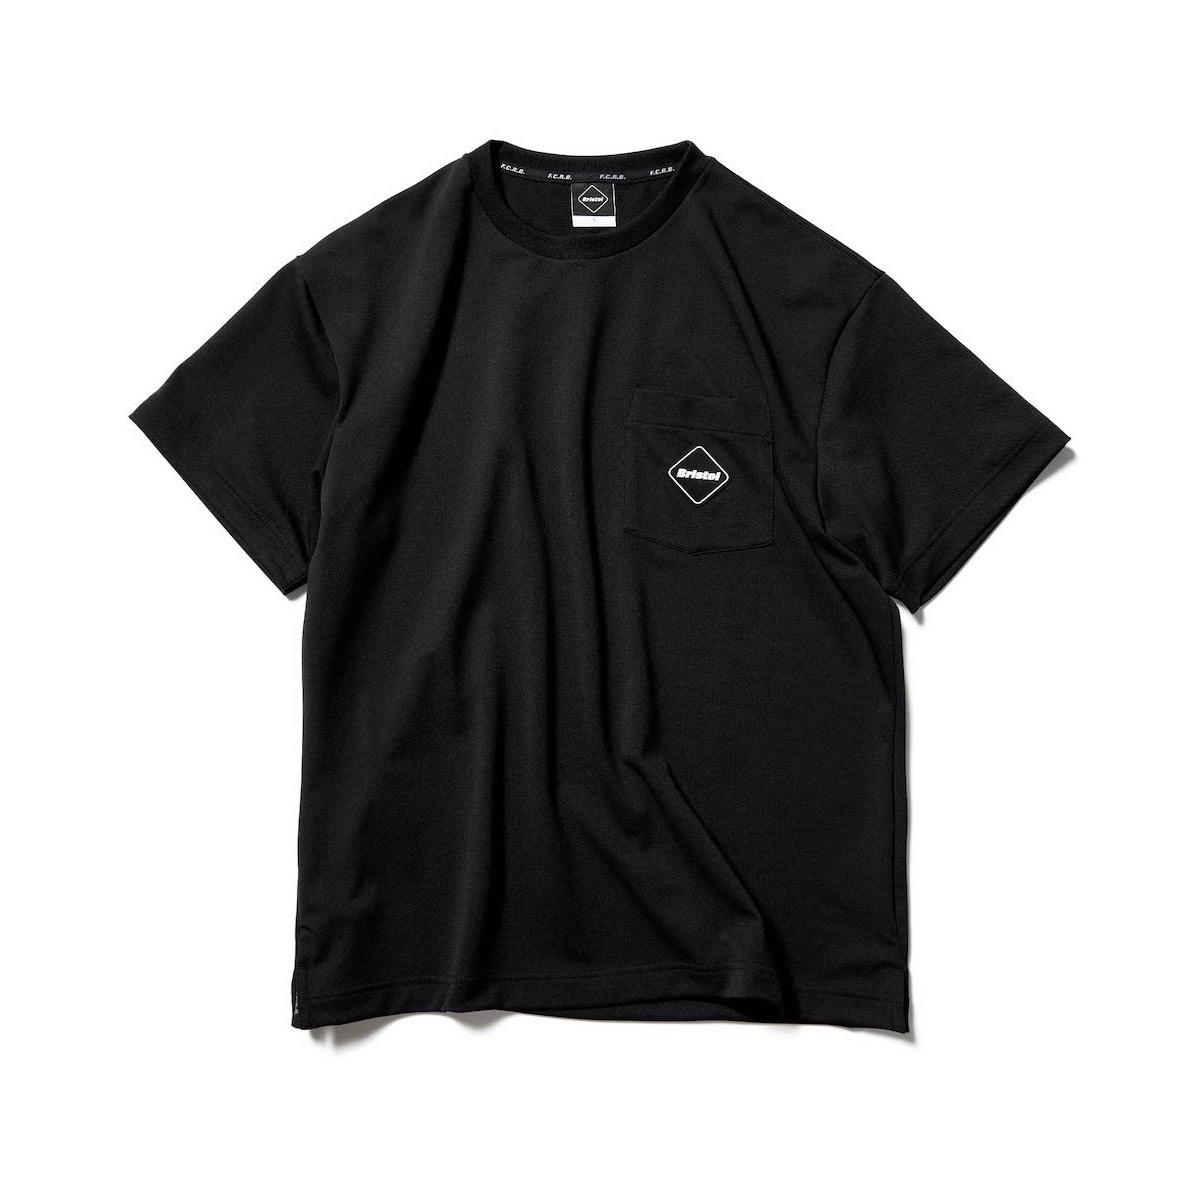 F.C.Real Bristol / SEED STITCH POCKET TEE (Black)正面